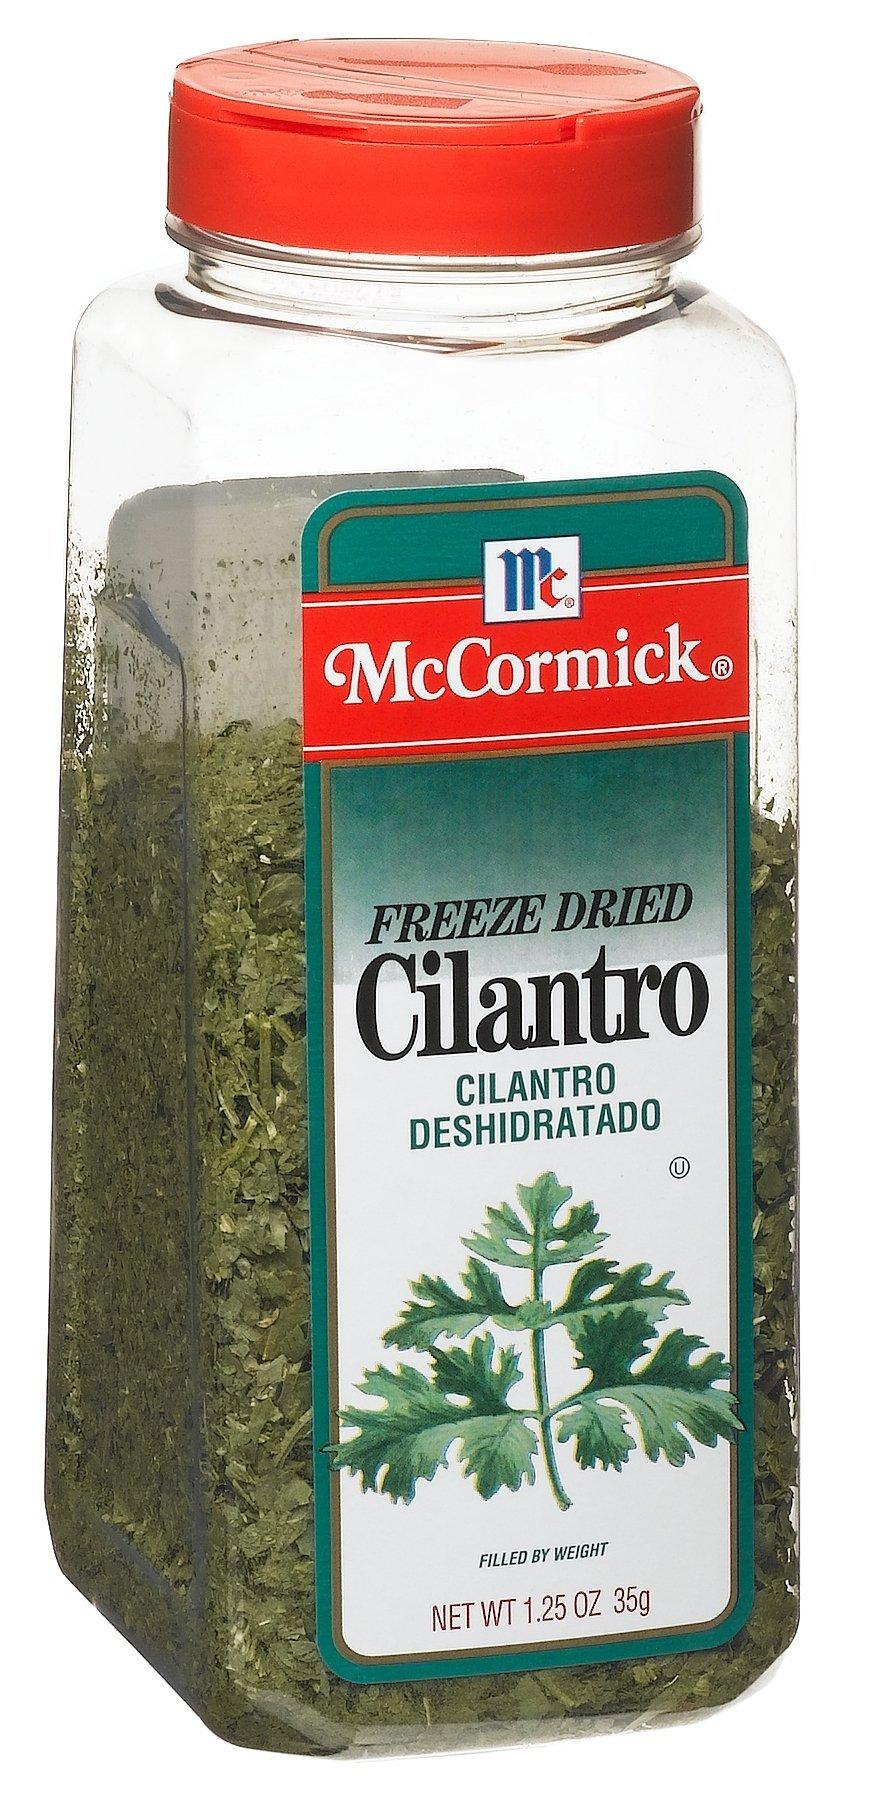 McCormick Cilantro, Freeze Dried, 1.25-Ounce Unit